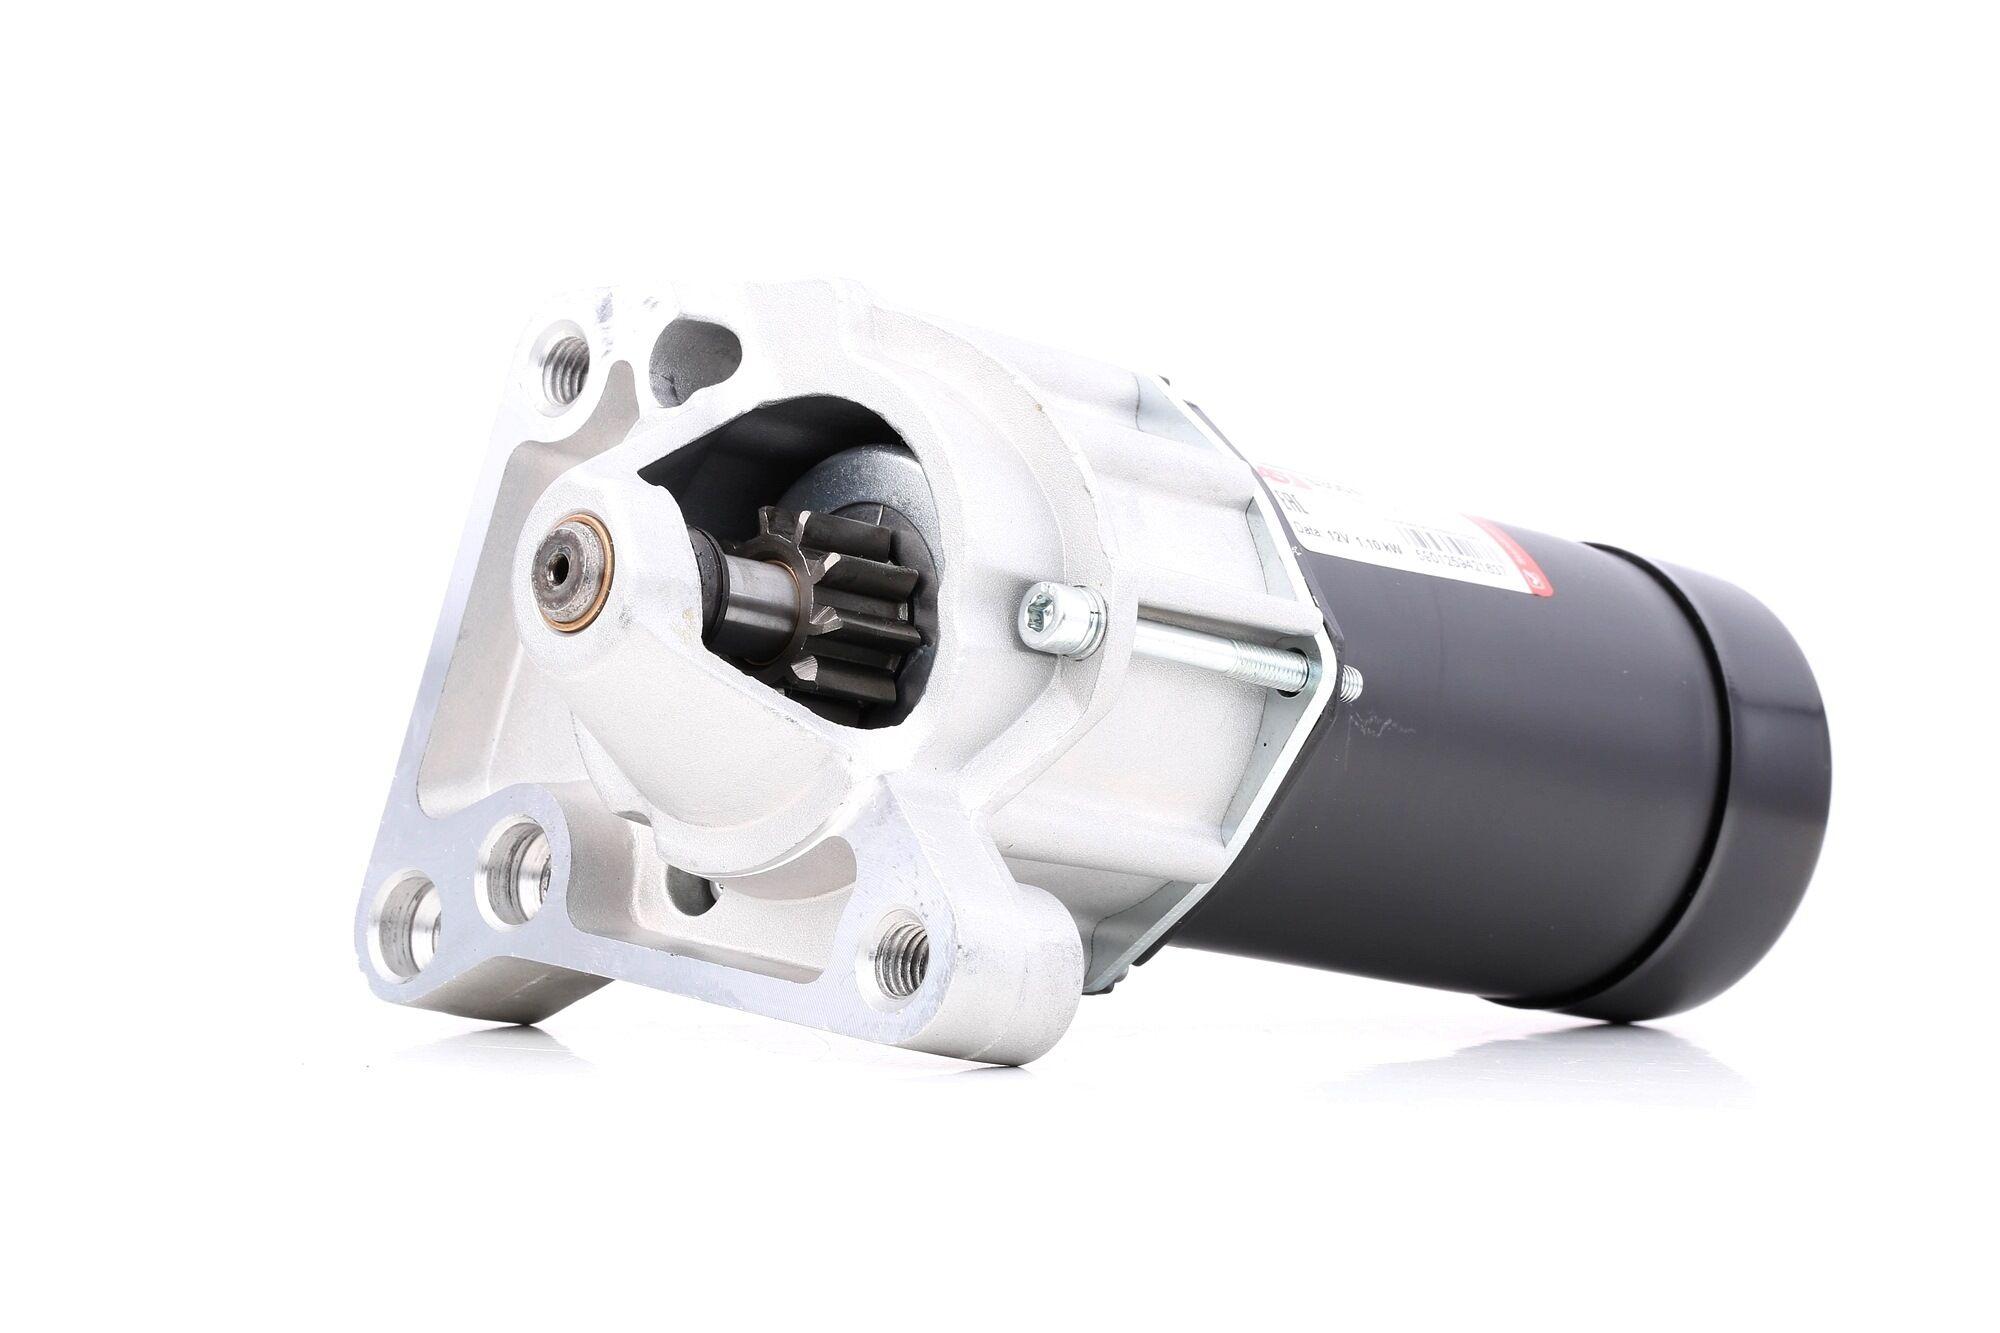 AS-PL Starttimoottori Brand new AS-PL Alternator rectifier S3004 Startti,Käynnistinmoottori RENAULT,HYUNDAI,VOLVO,CLIO II BB0/1/2_, CB0/1/2_